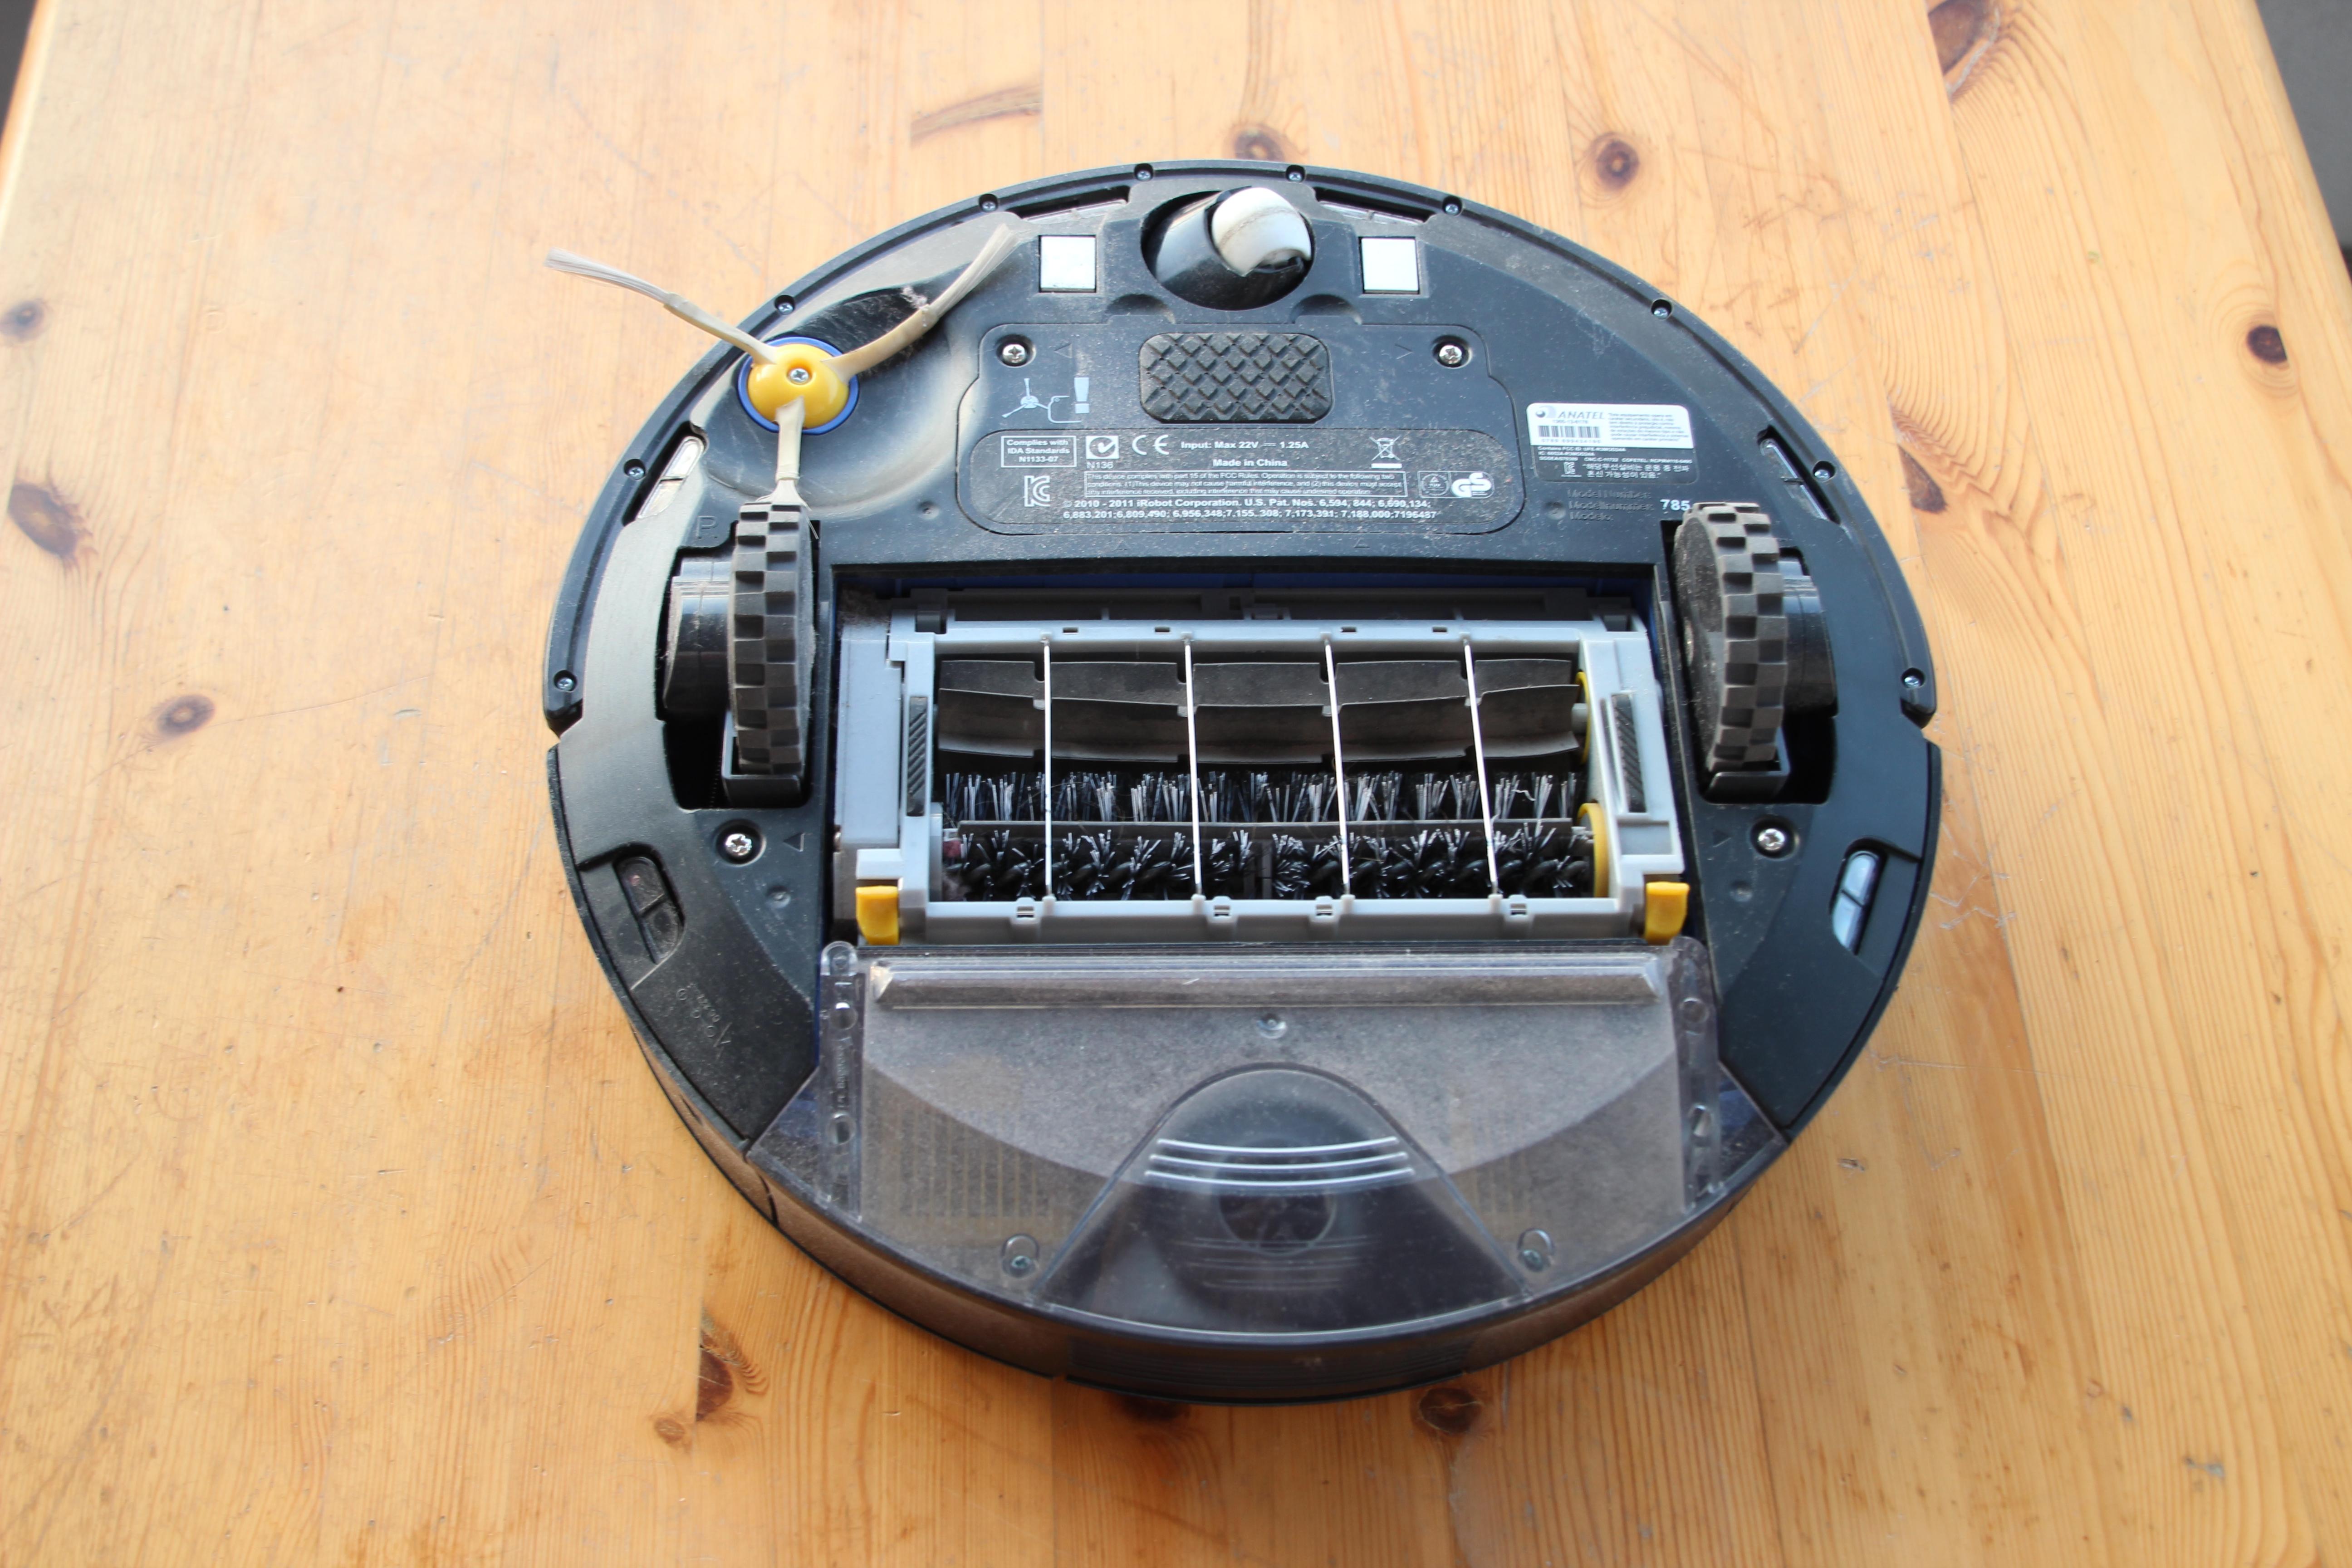 File:IRobot Roomba 785 05 (fcm).jpg